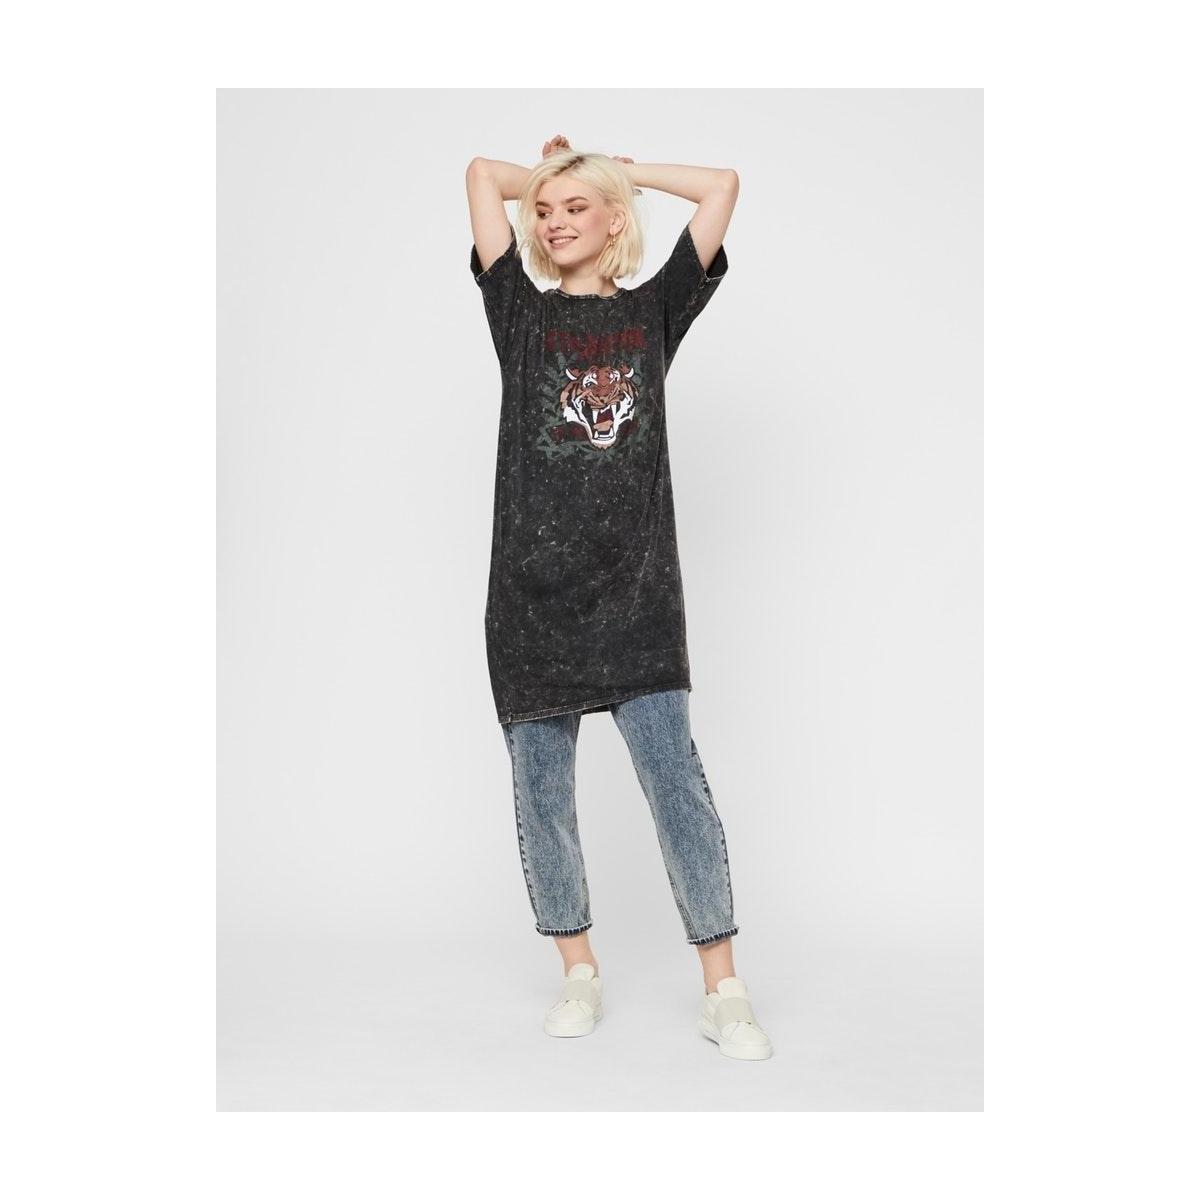 nmweekend s/s washed tee dress 27013593 noisy may jurk black/stronger